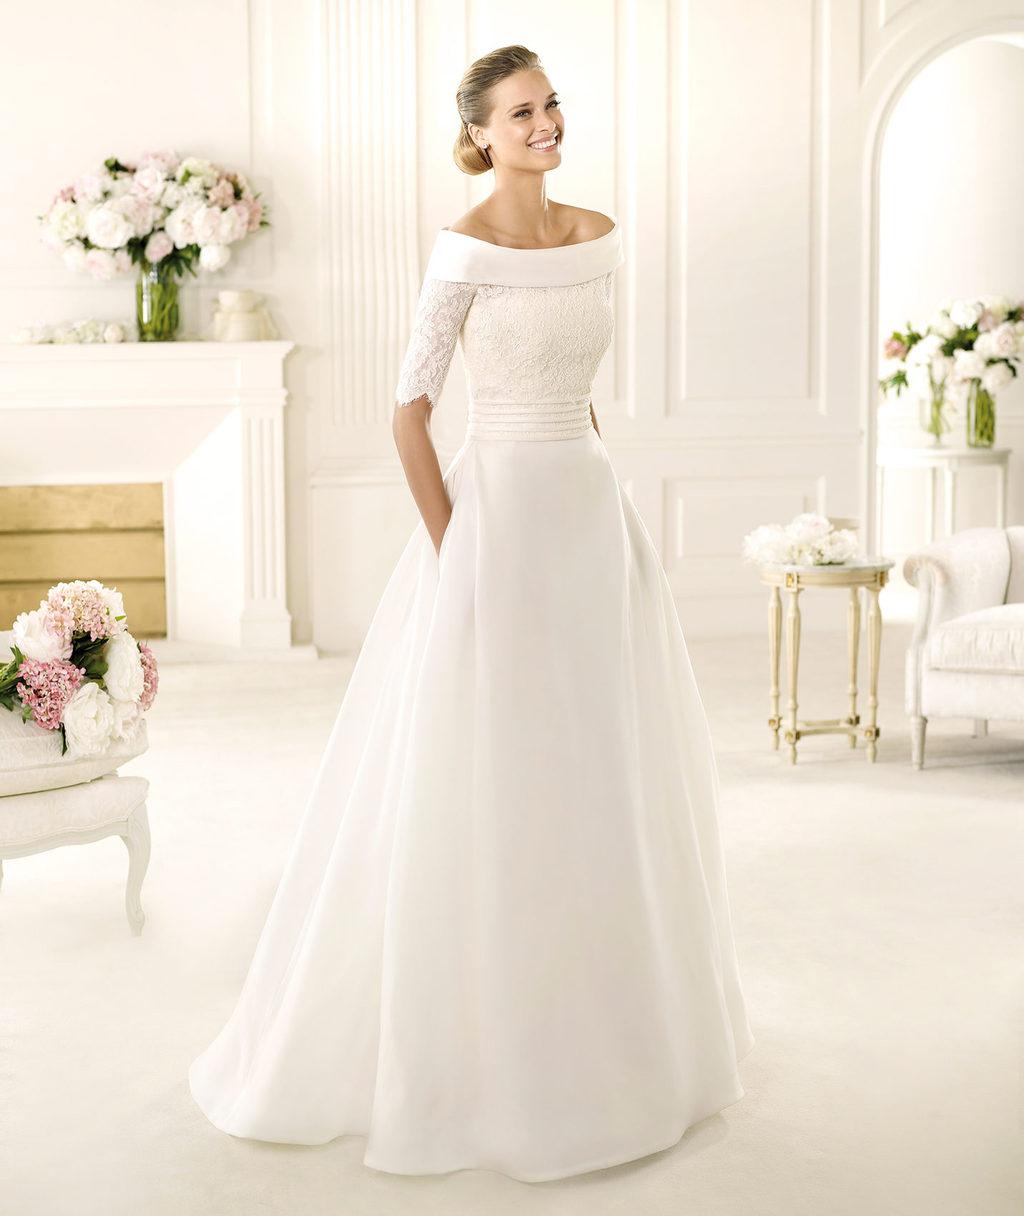 2013-manuel-mota-wedding-dress-for-pronovias.full